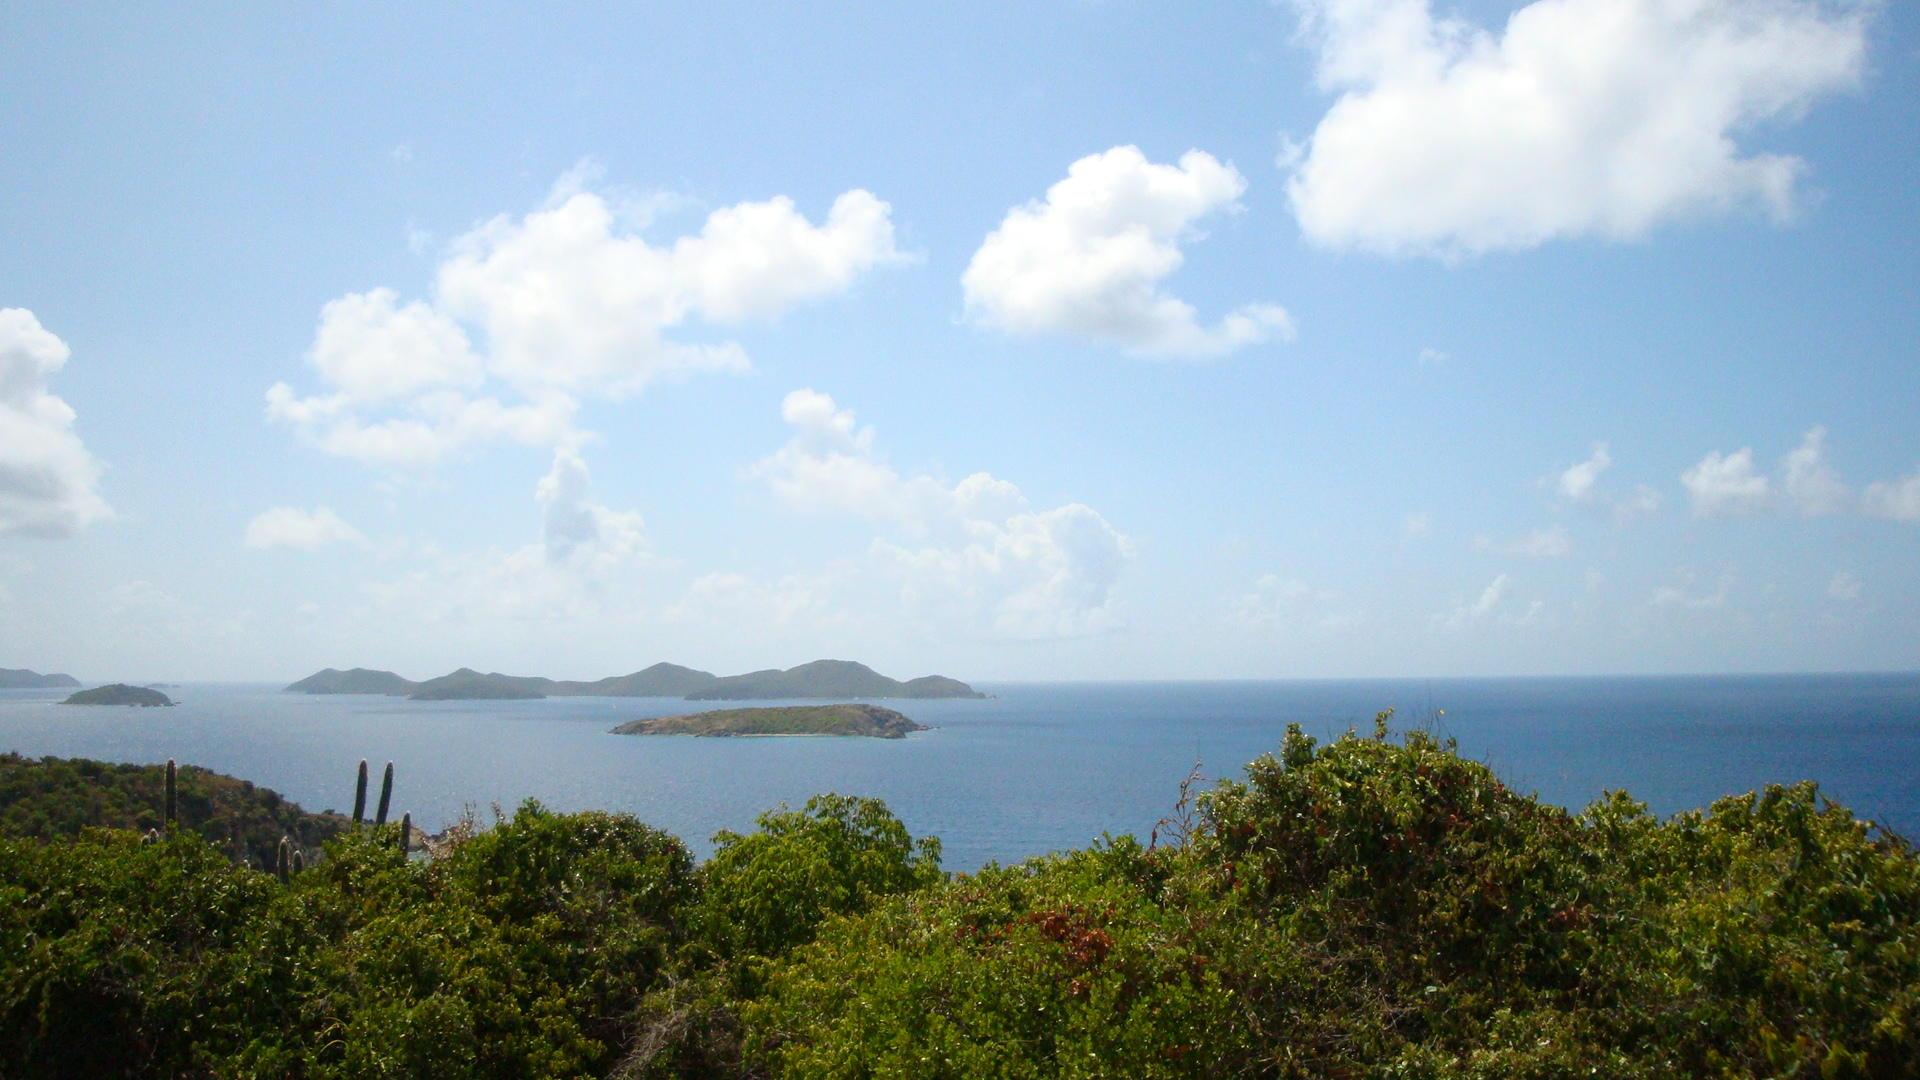 St John, Virgin Islands 00830, ,Land,For Sale,17-178